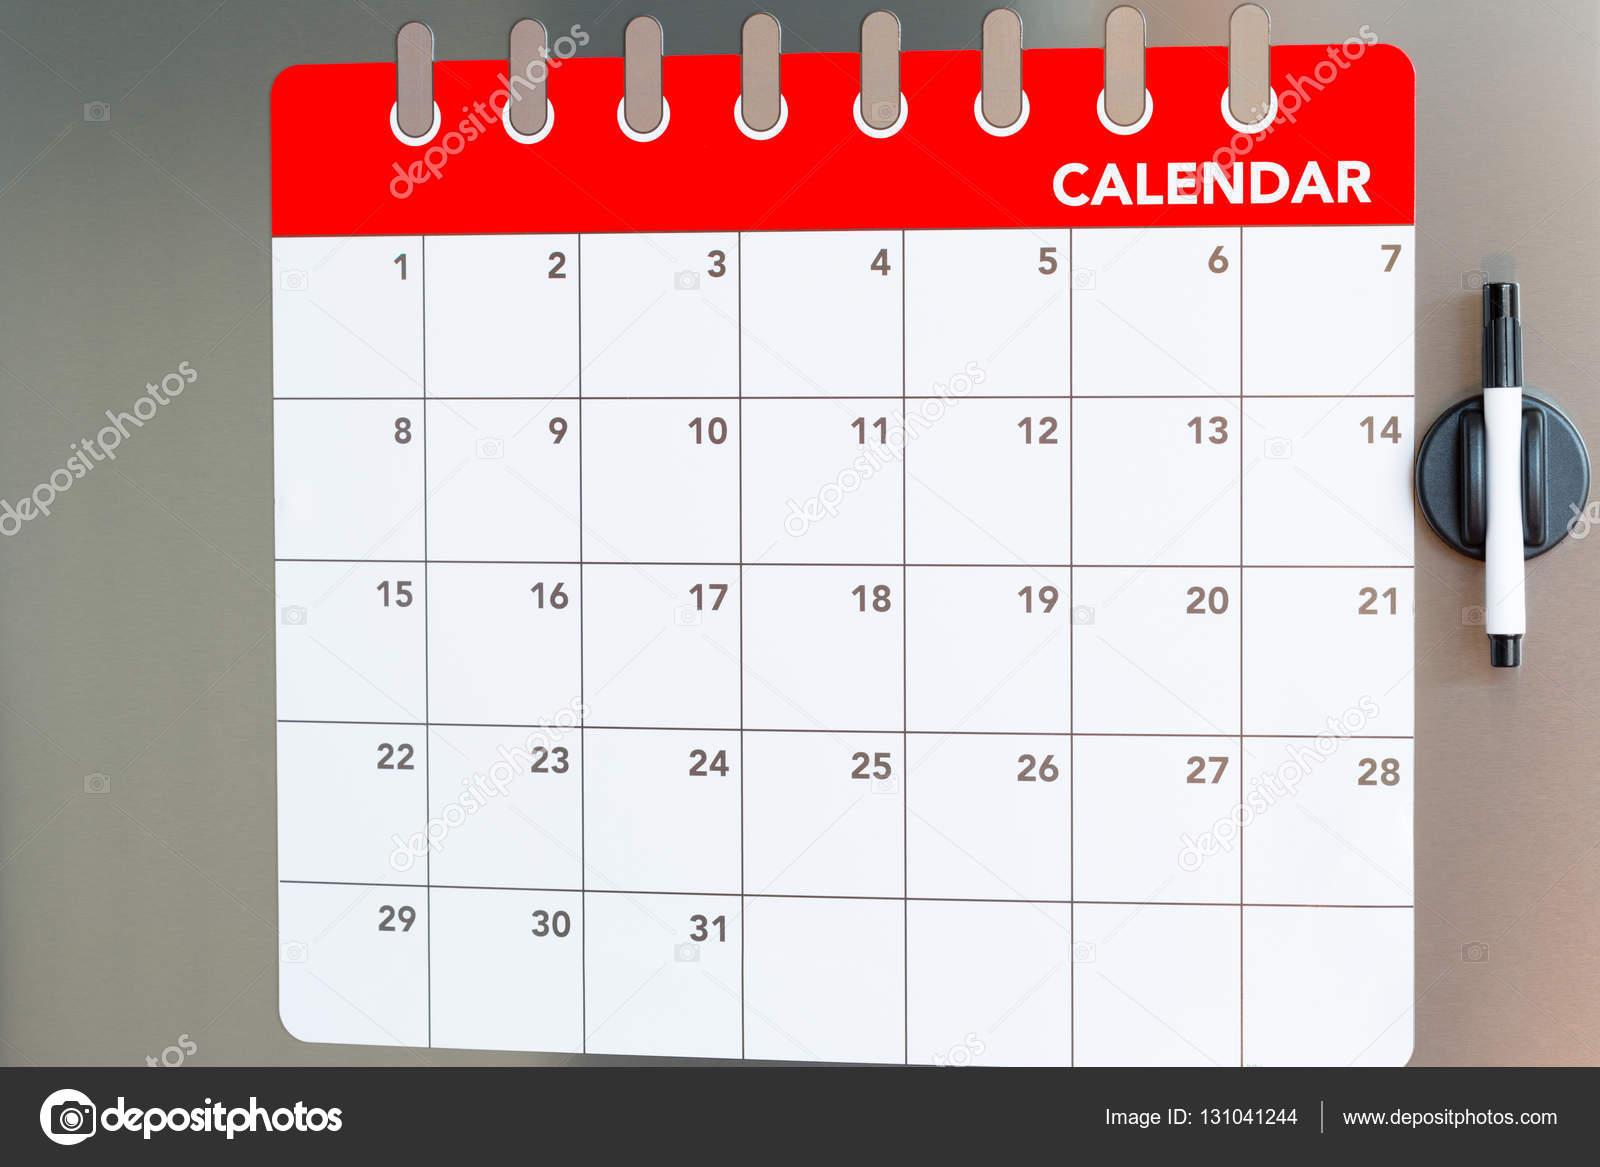 Kühlschrank Planer : Monatskalender im kühlschrank u2014 stockfoto © edu1971 #131041244